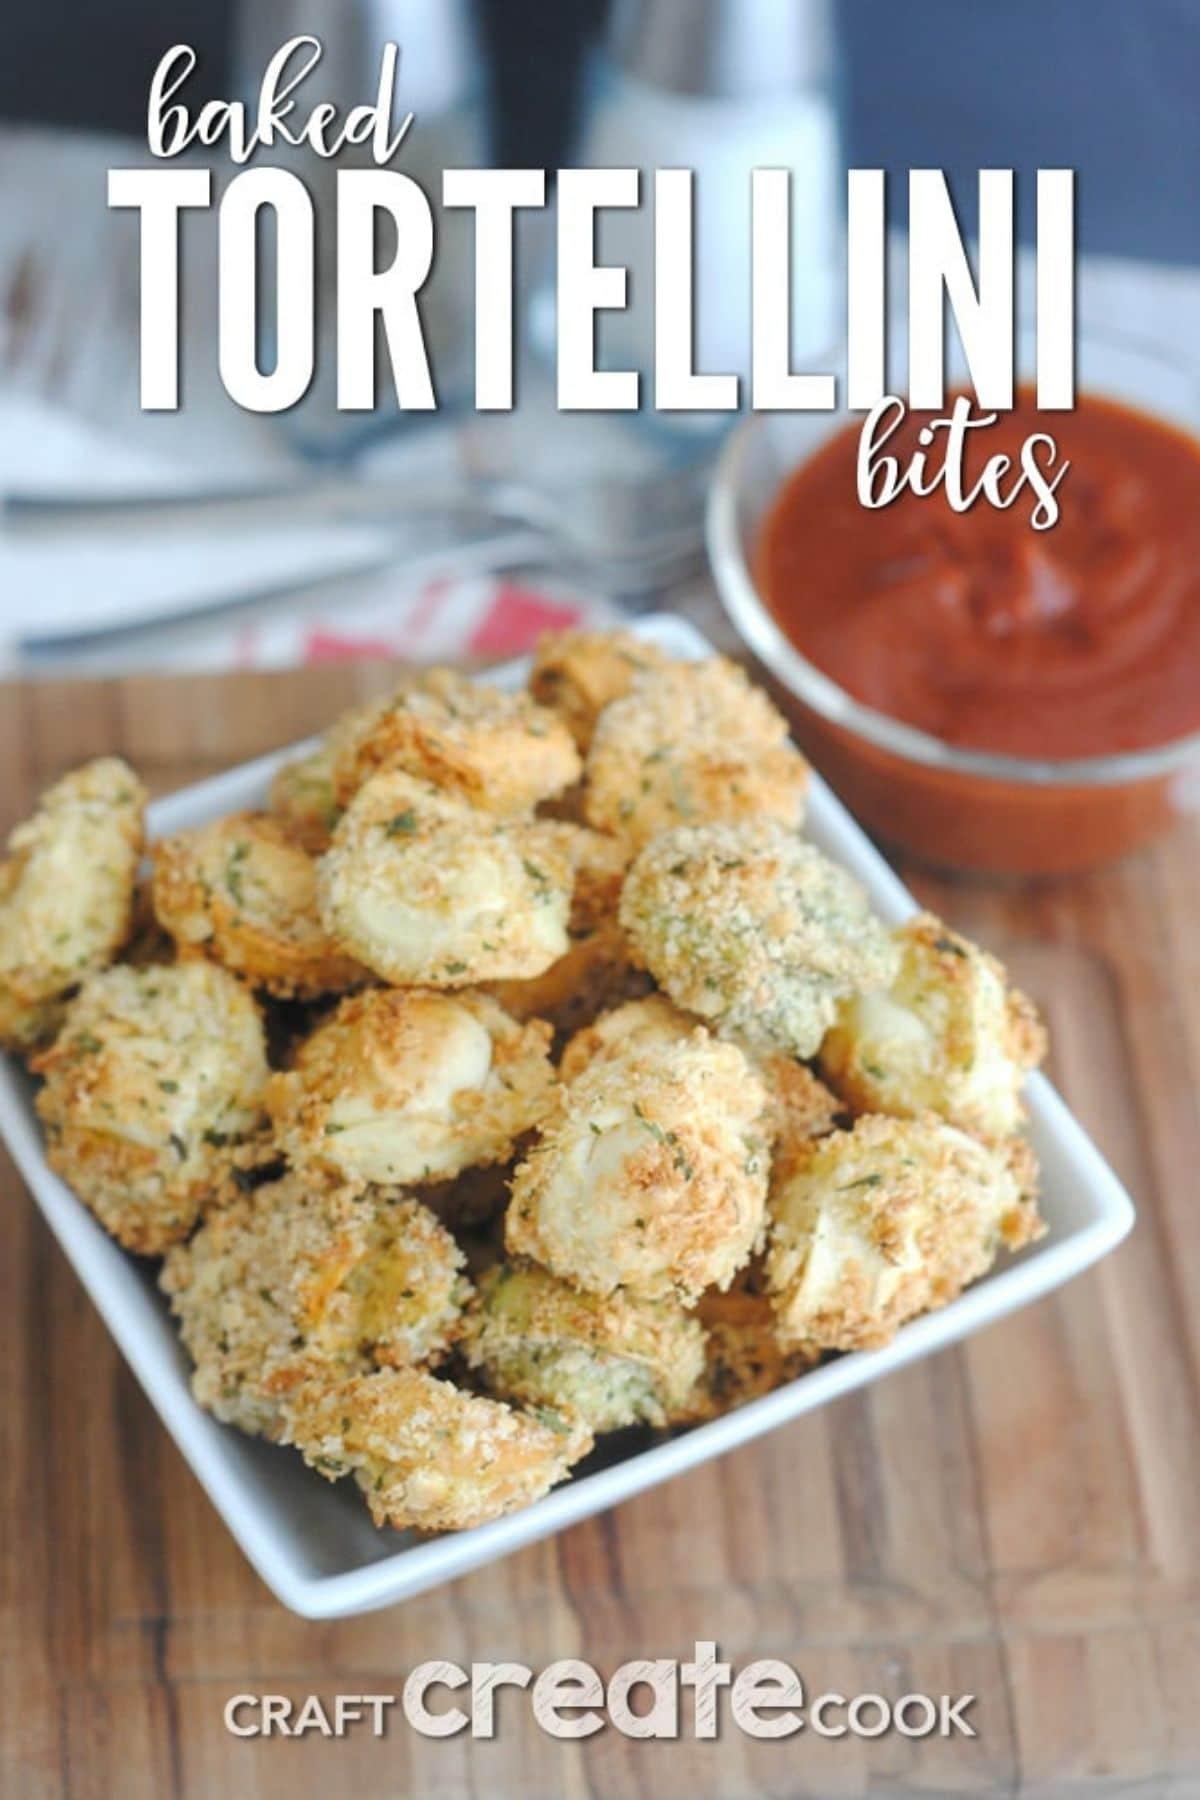 Tortellini bites in bowl